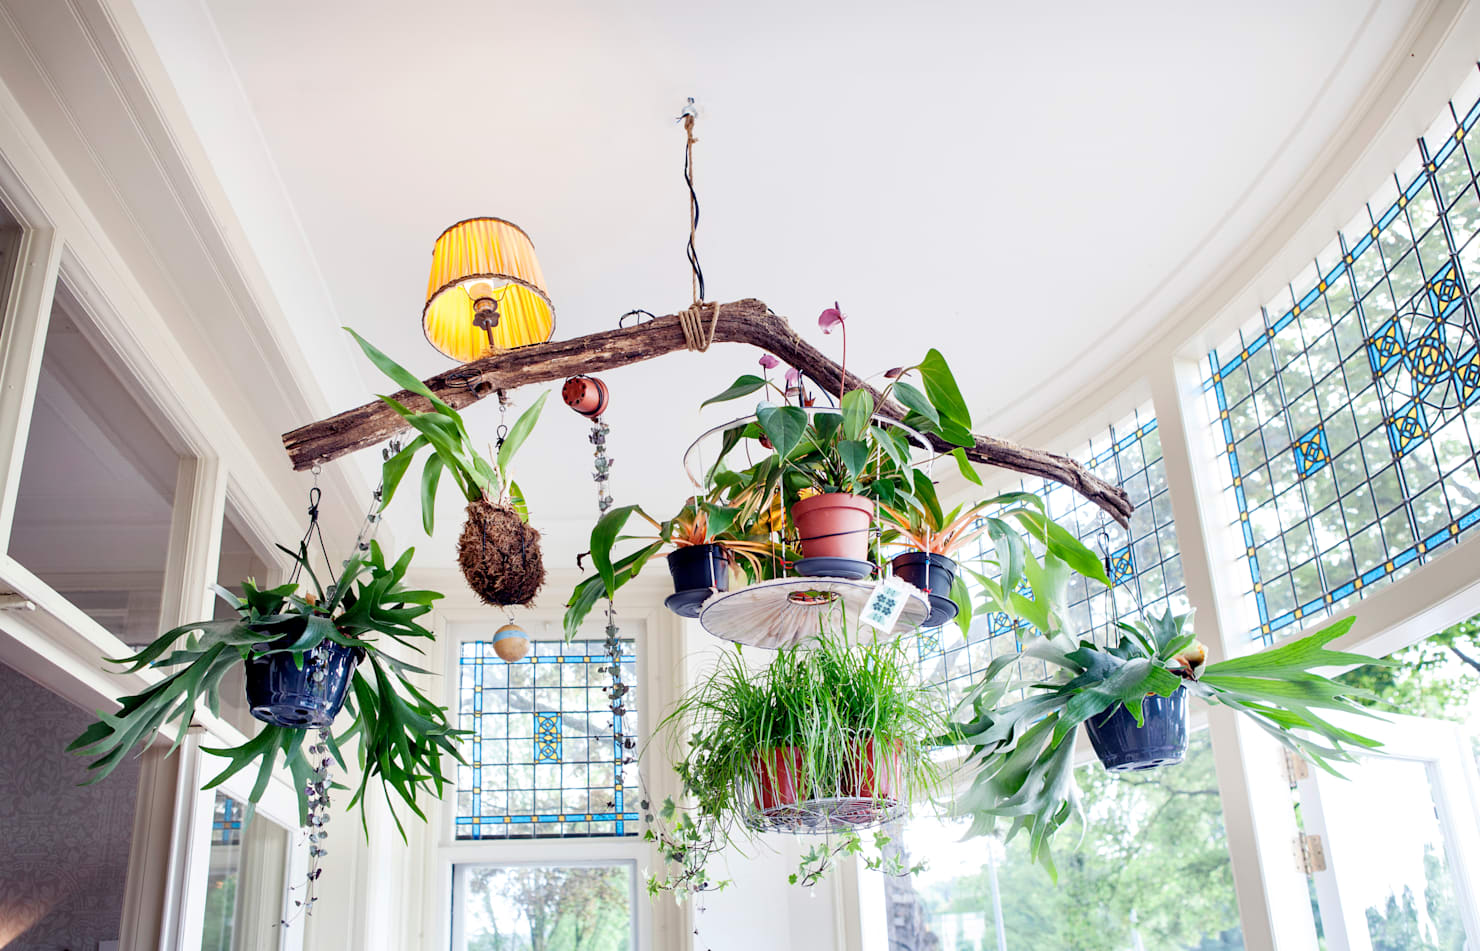 10 ways to style up your indoor garden